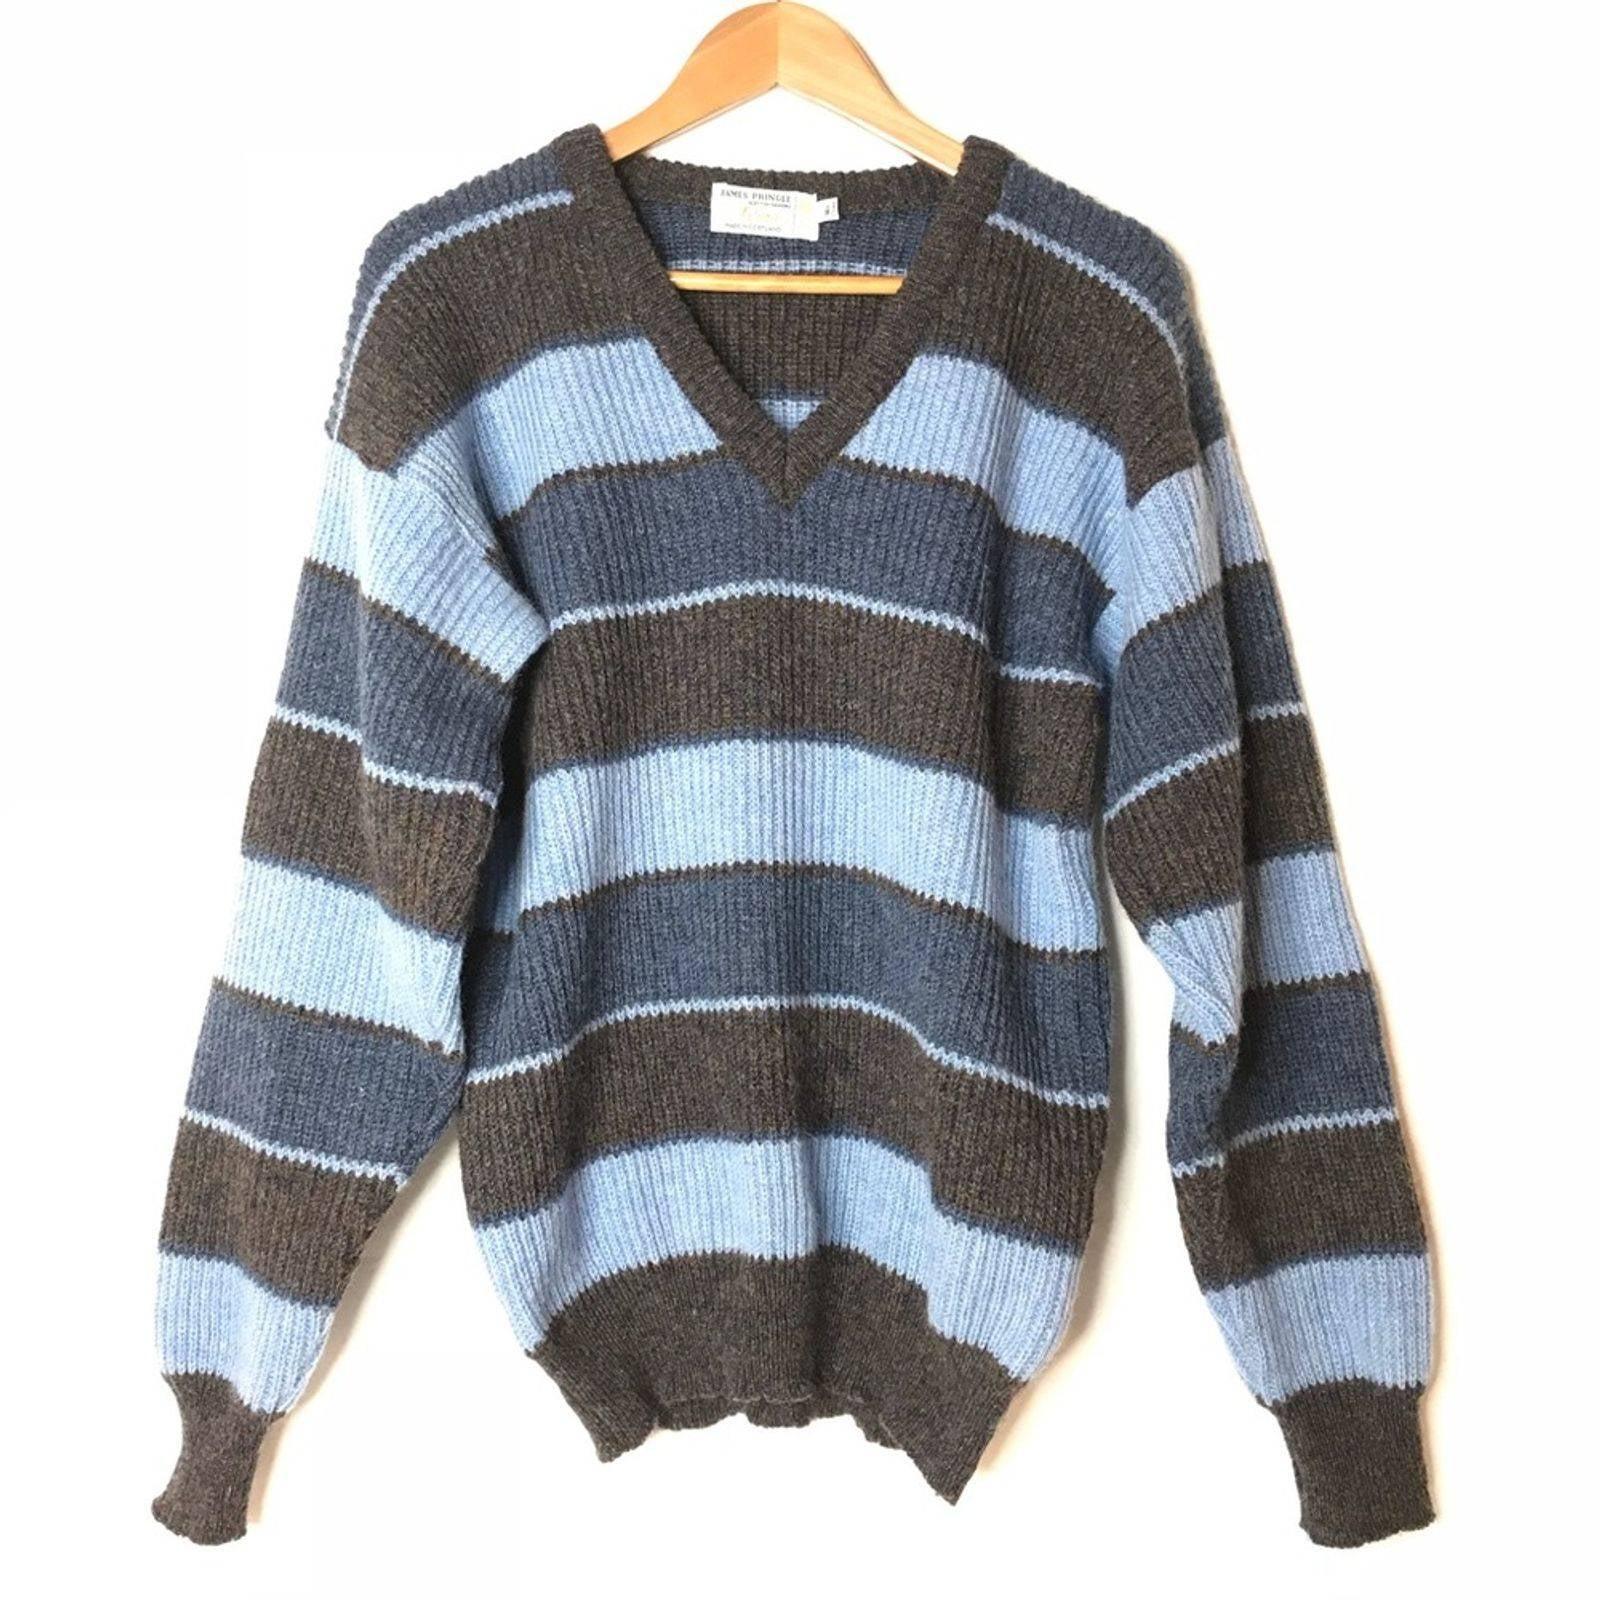 James Pringle Scotland Wool Sweater M/L